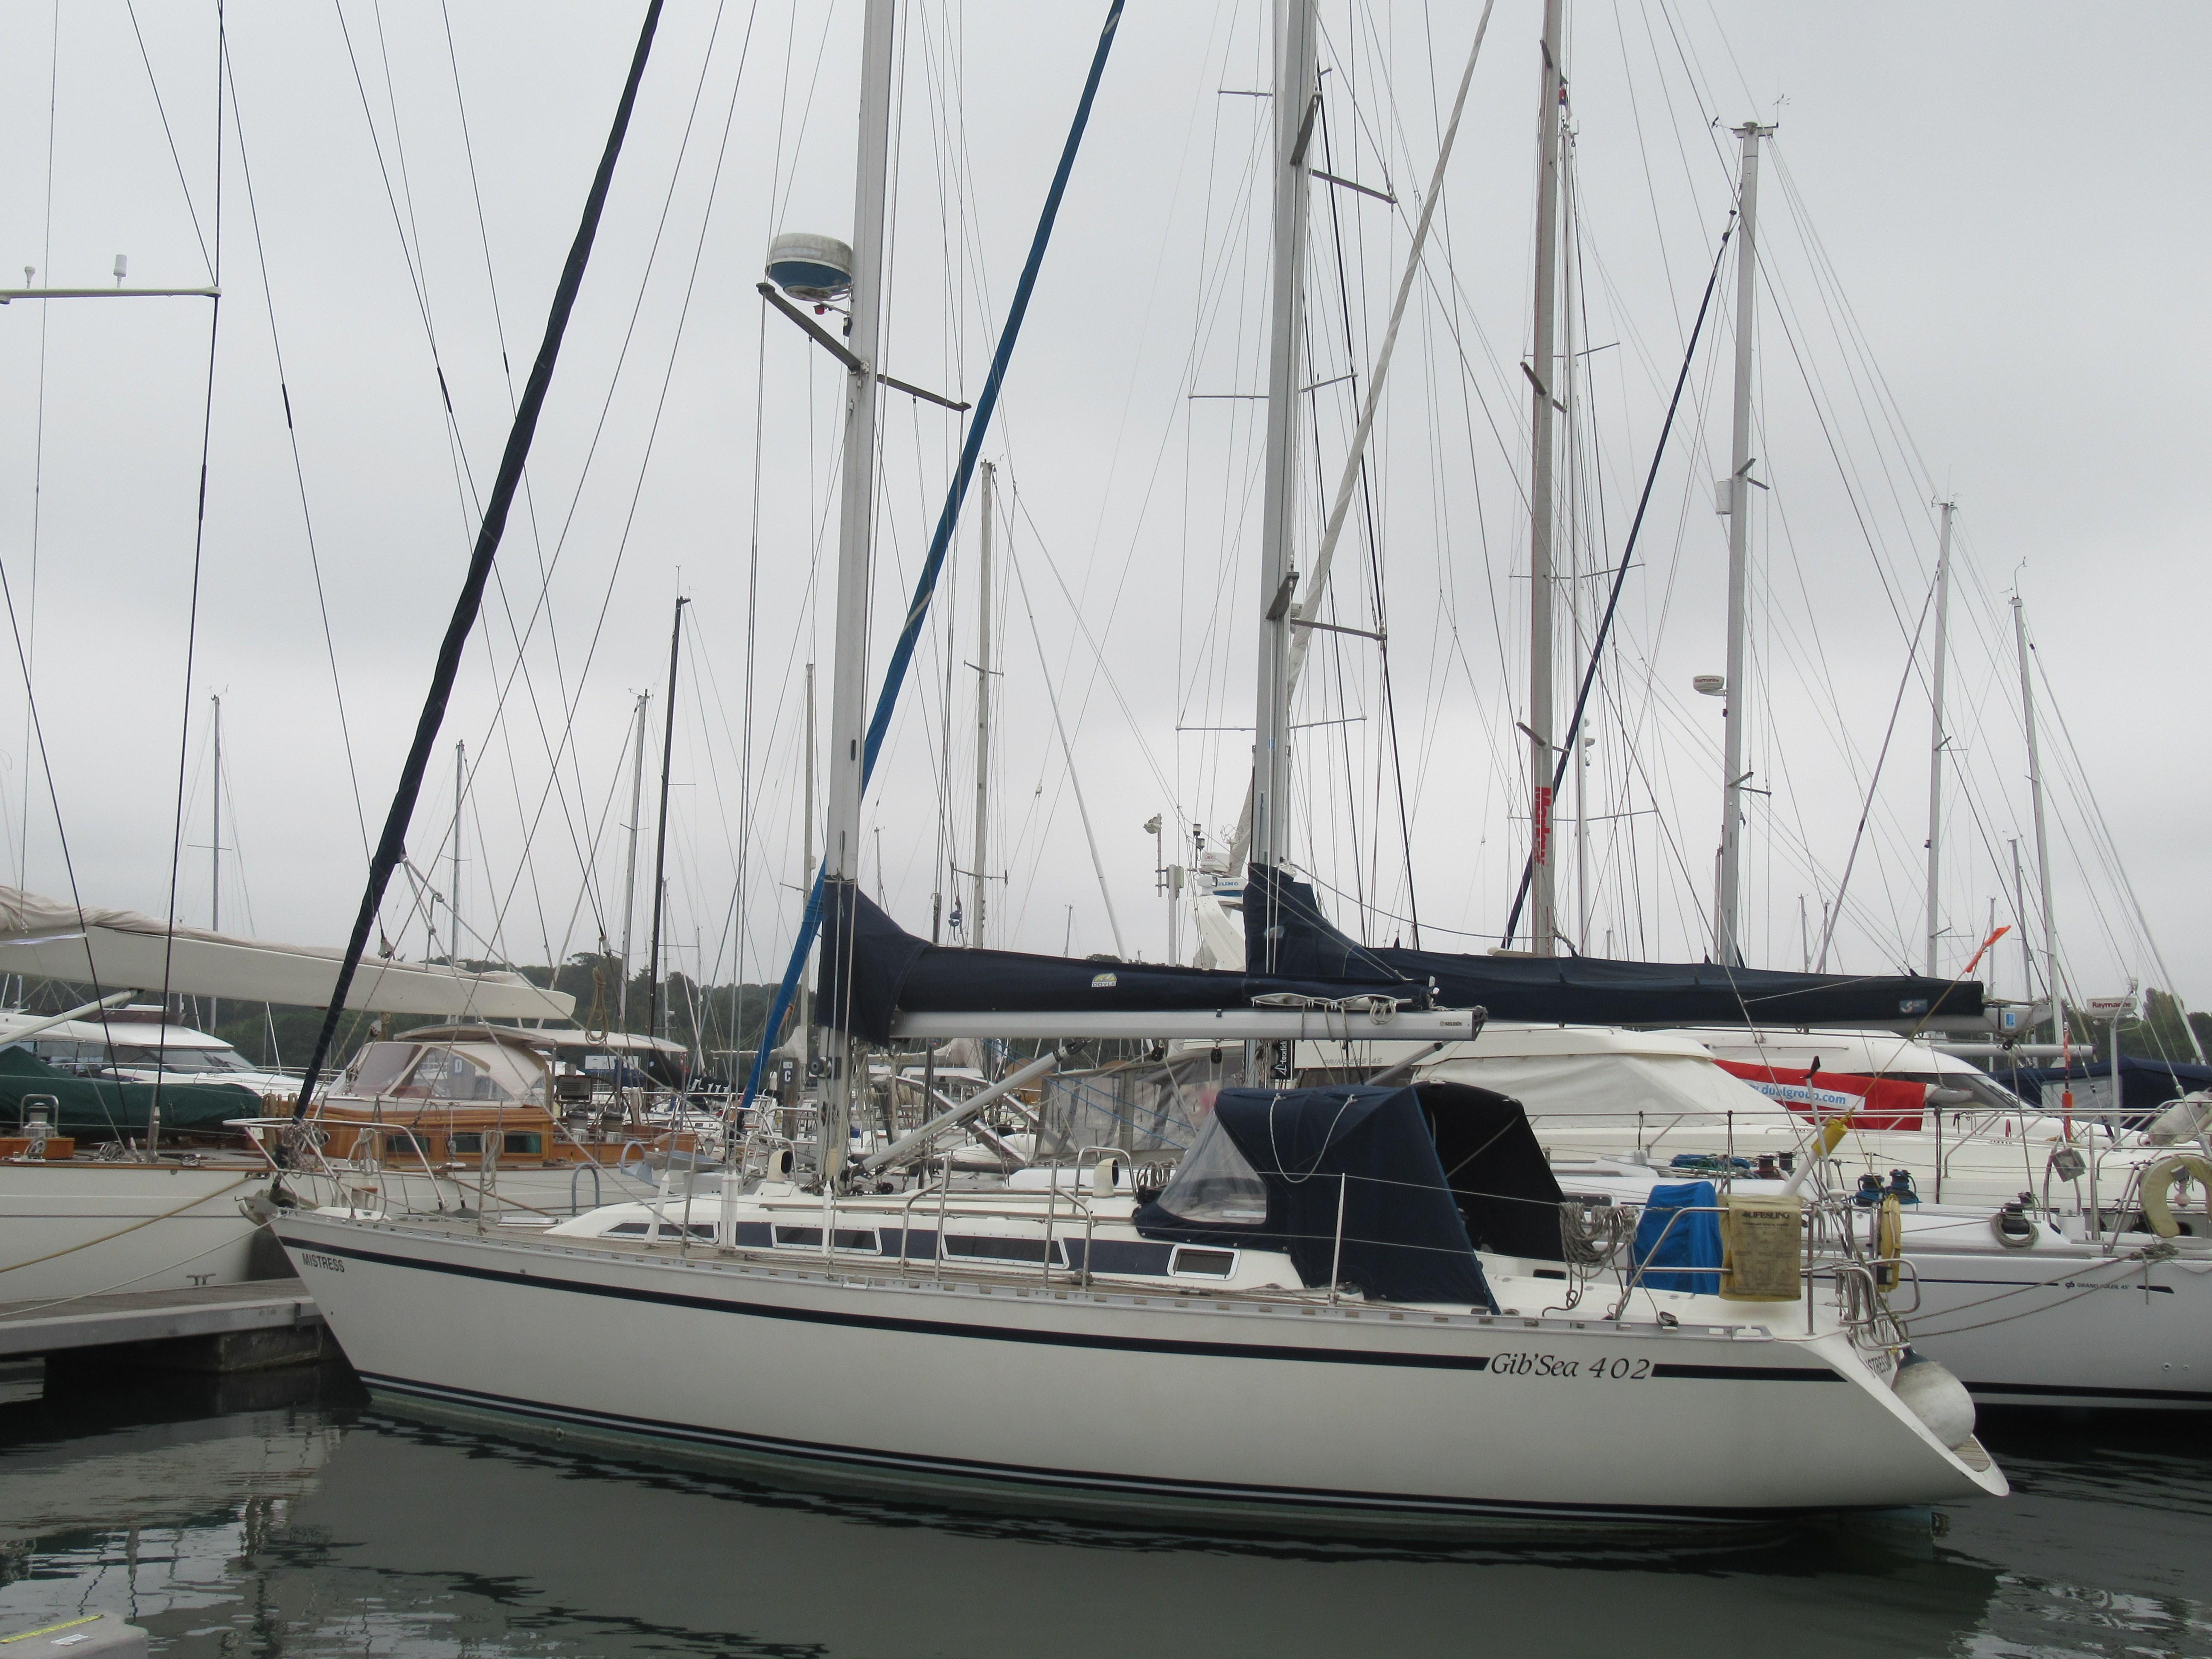 Gib'Sea 402 MASTER FOR SALE - 1988 Gibsea 402 Master